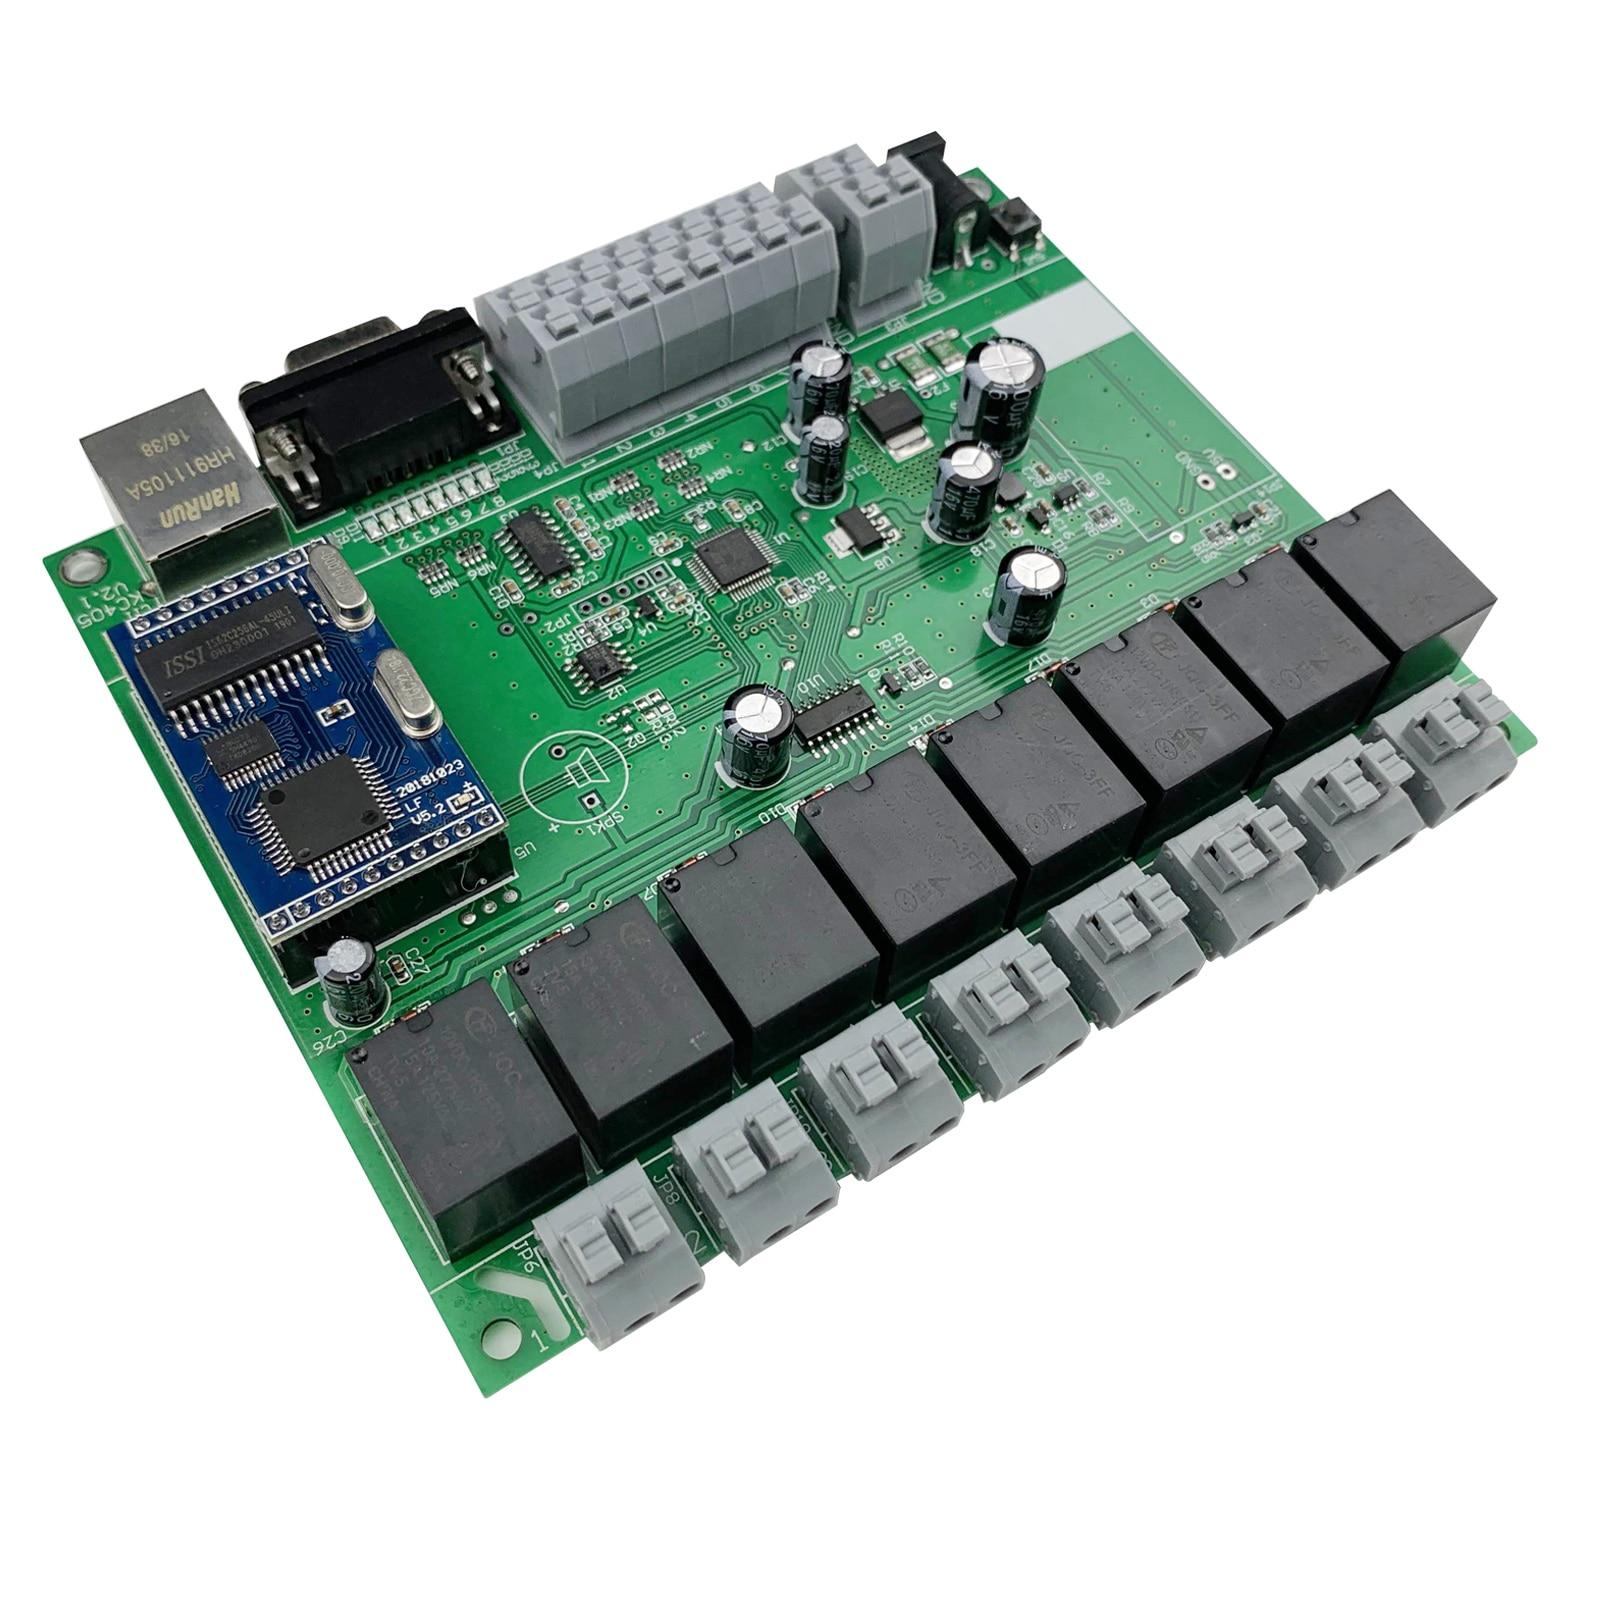 8 Channel Ethernet Relay Module With GPIO Lan Wan Network RJ45 RS232 TCP IP Program Development